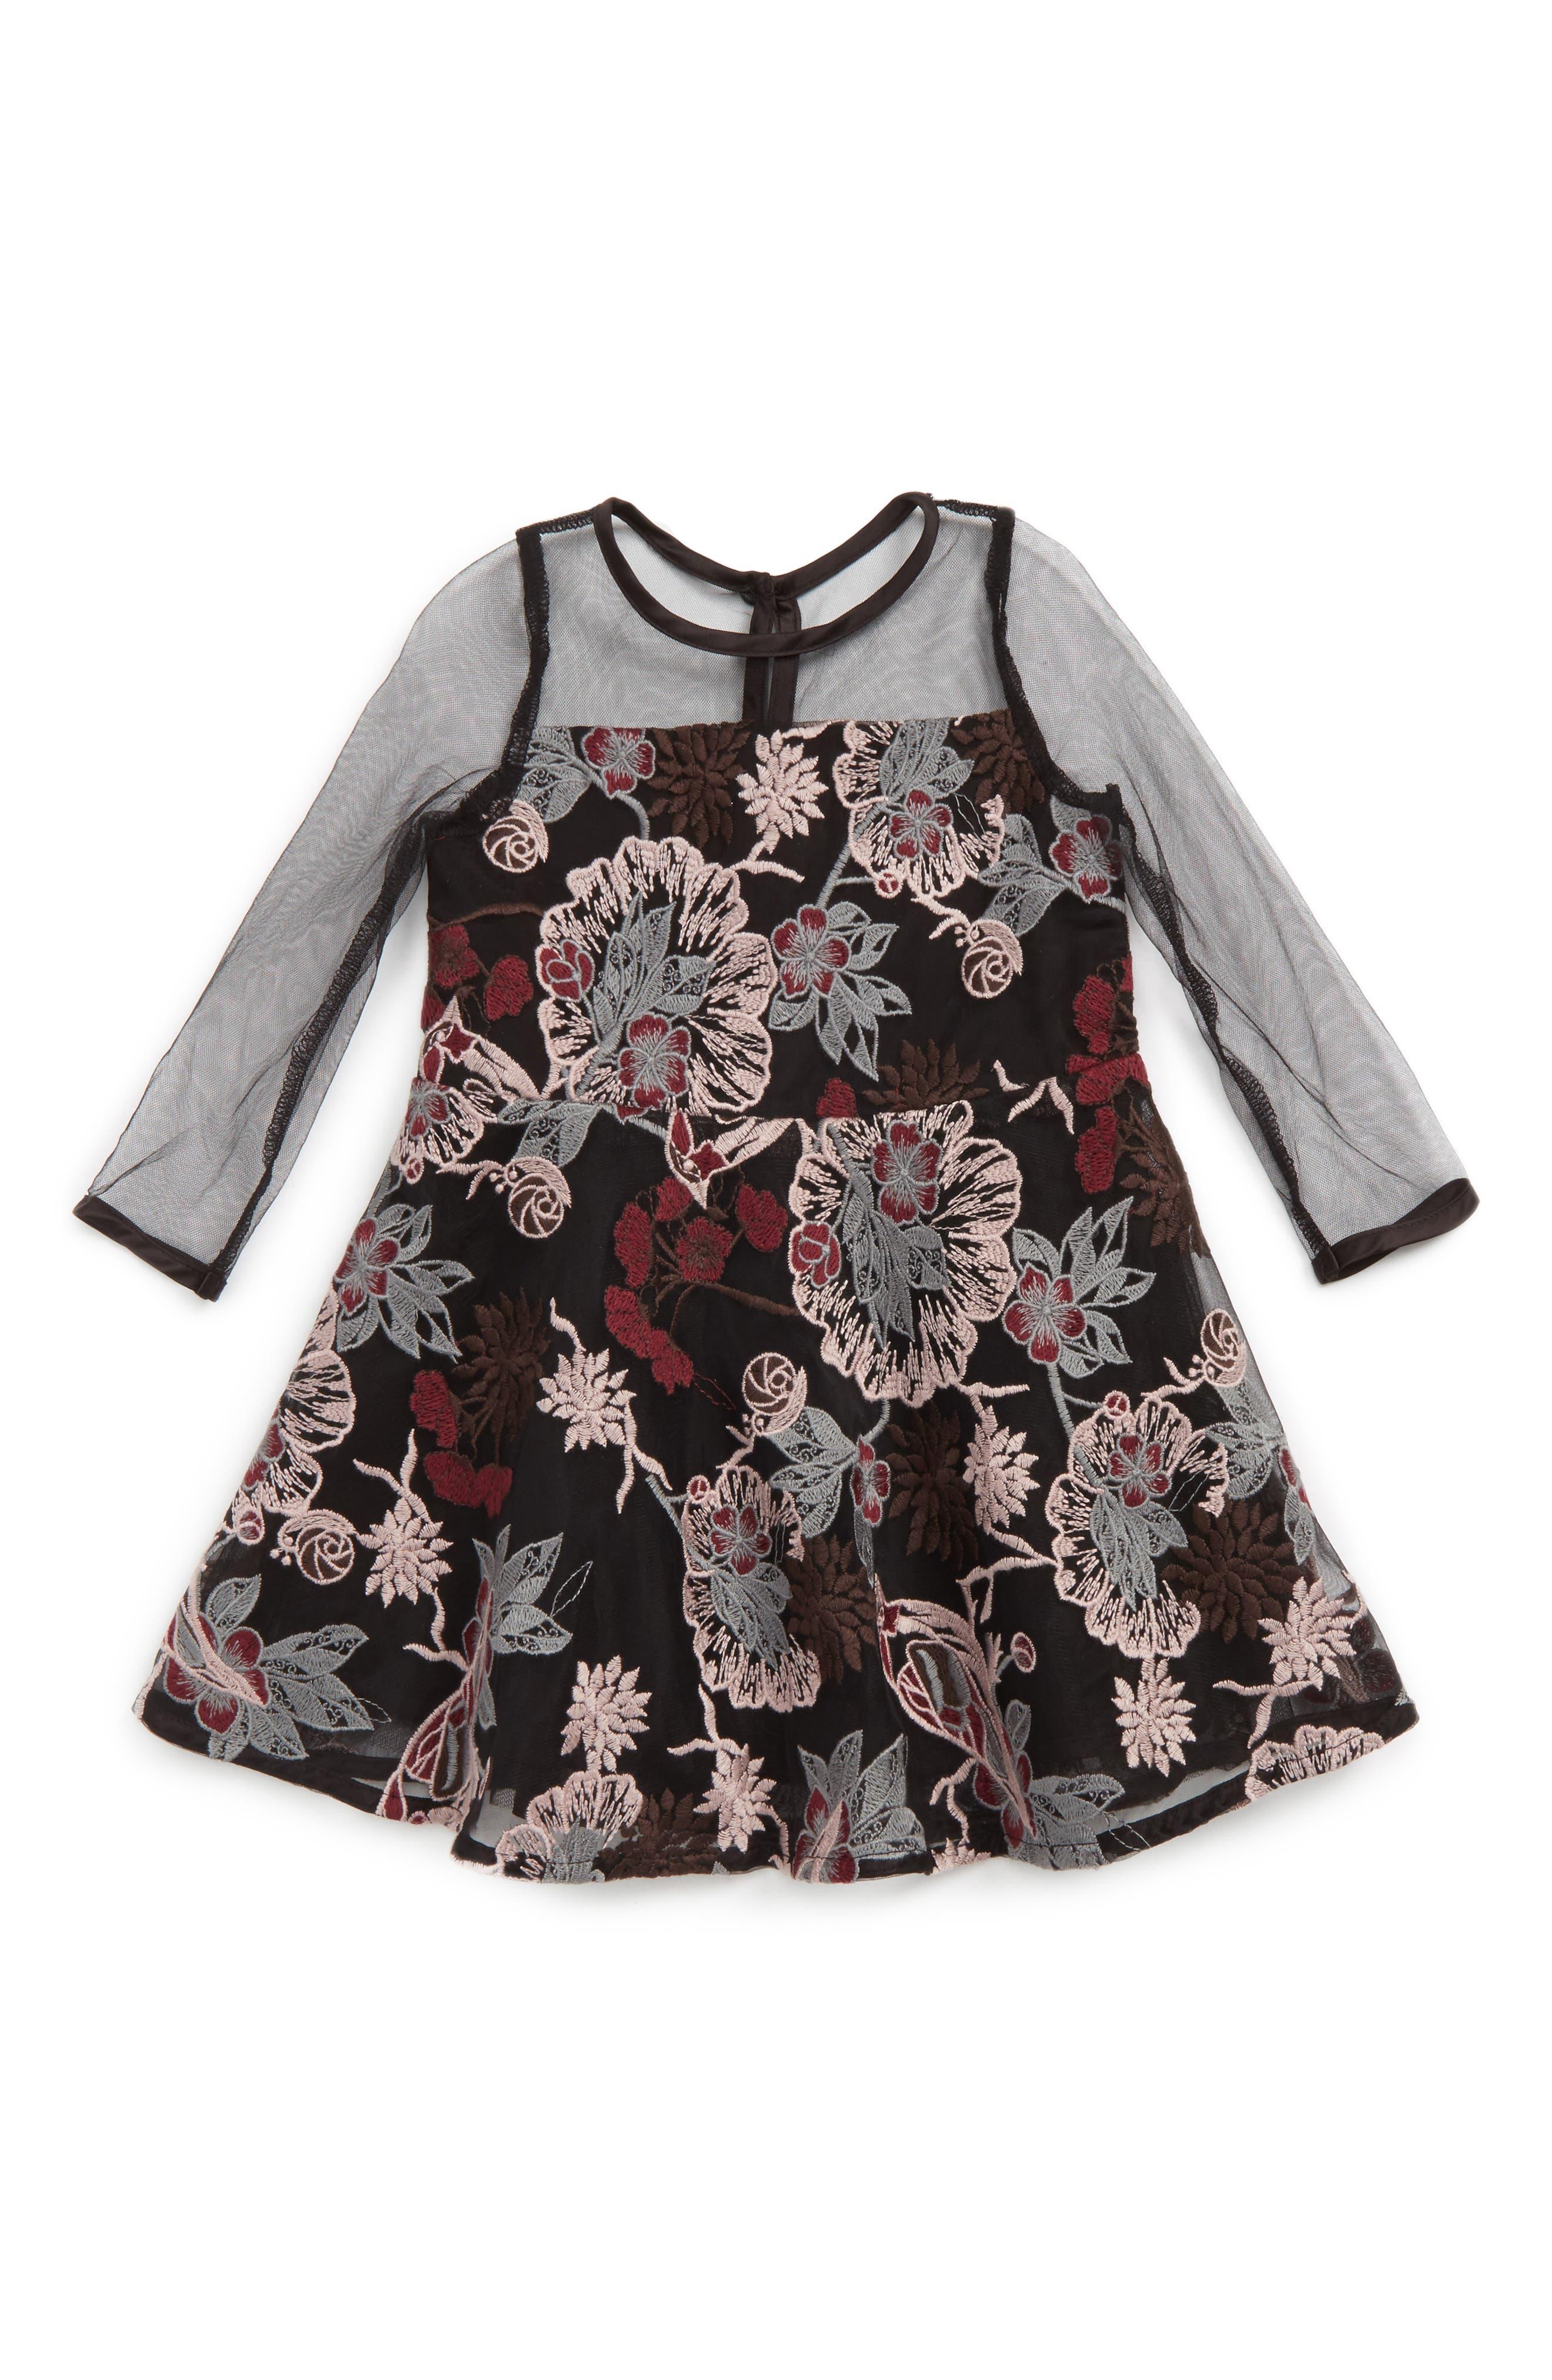 Alternate Image 1 Selected - Bardot Junior Lace Dress (Baby Girls & Toddler Girls)